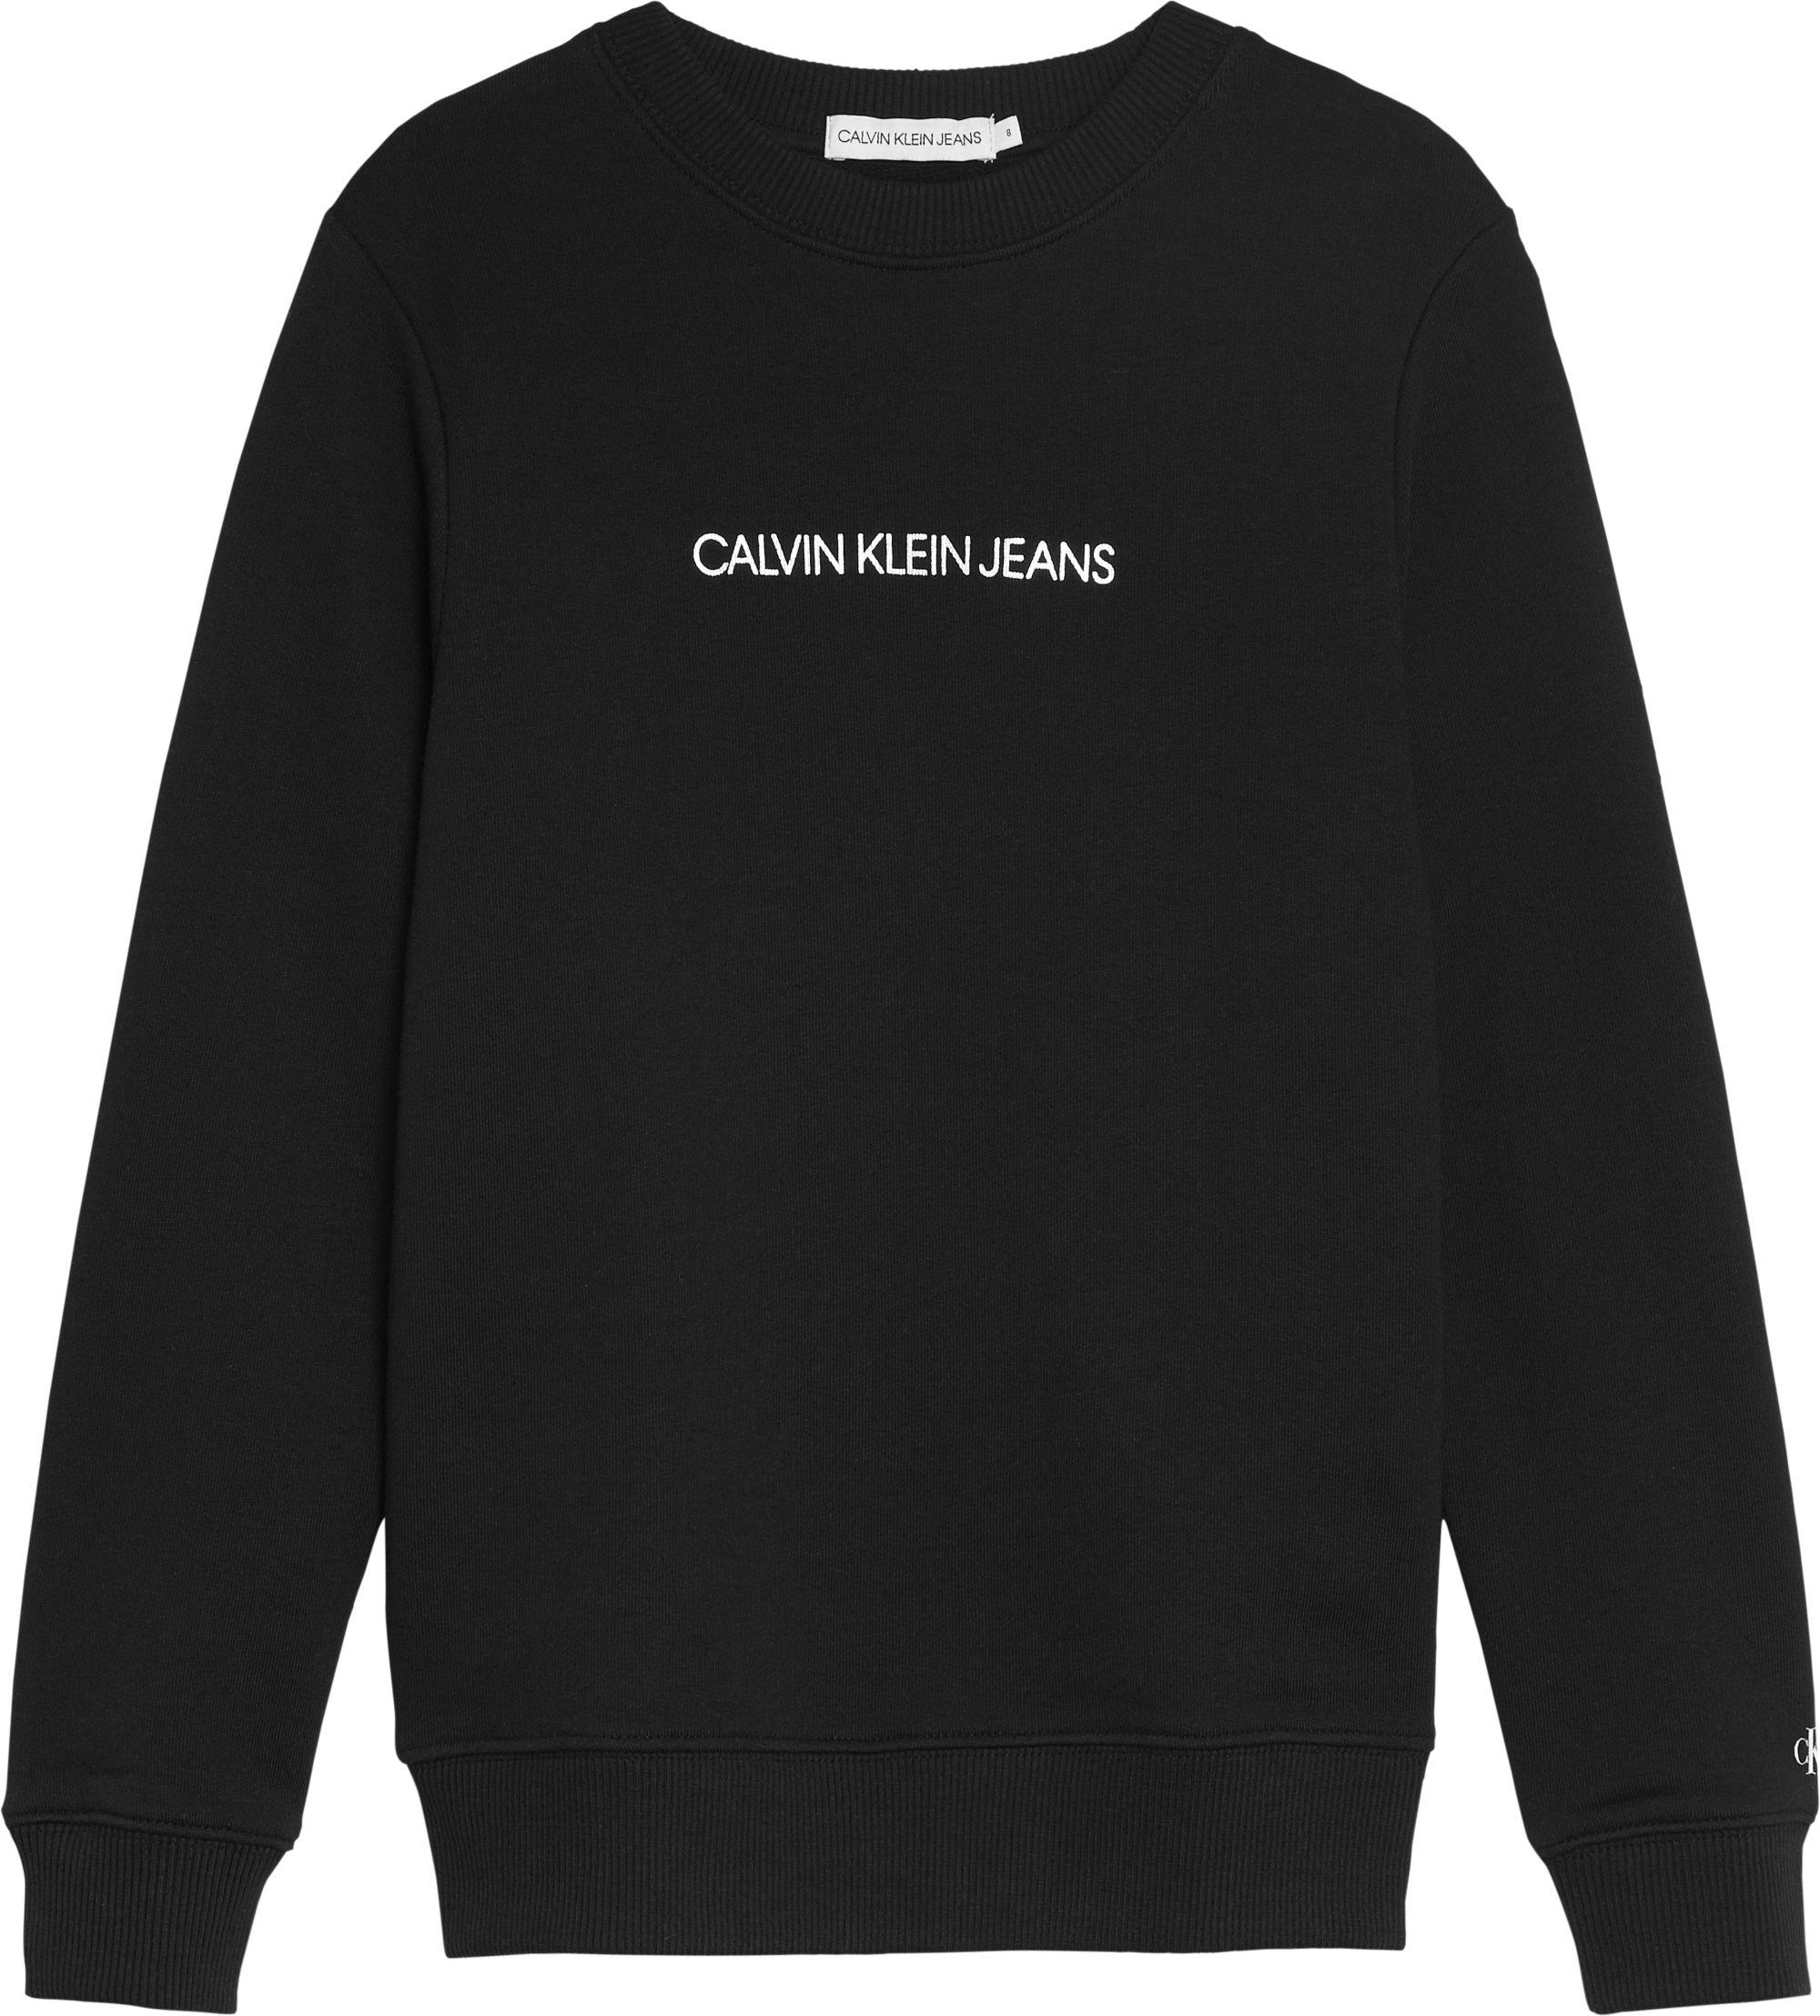 Calvin Klein, Metallic logo collegepaita